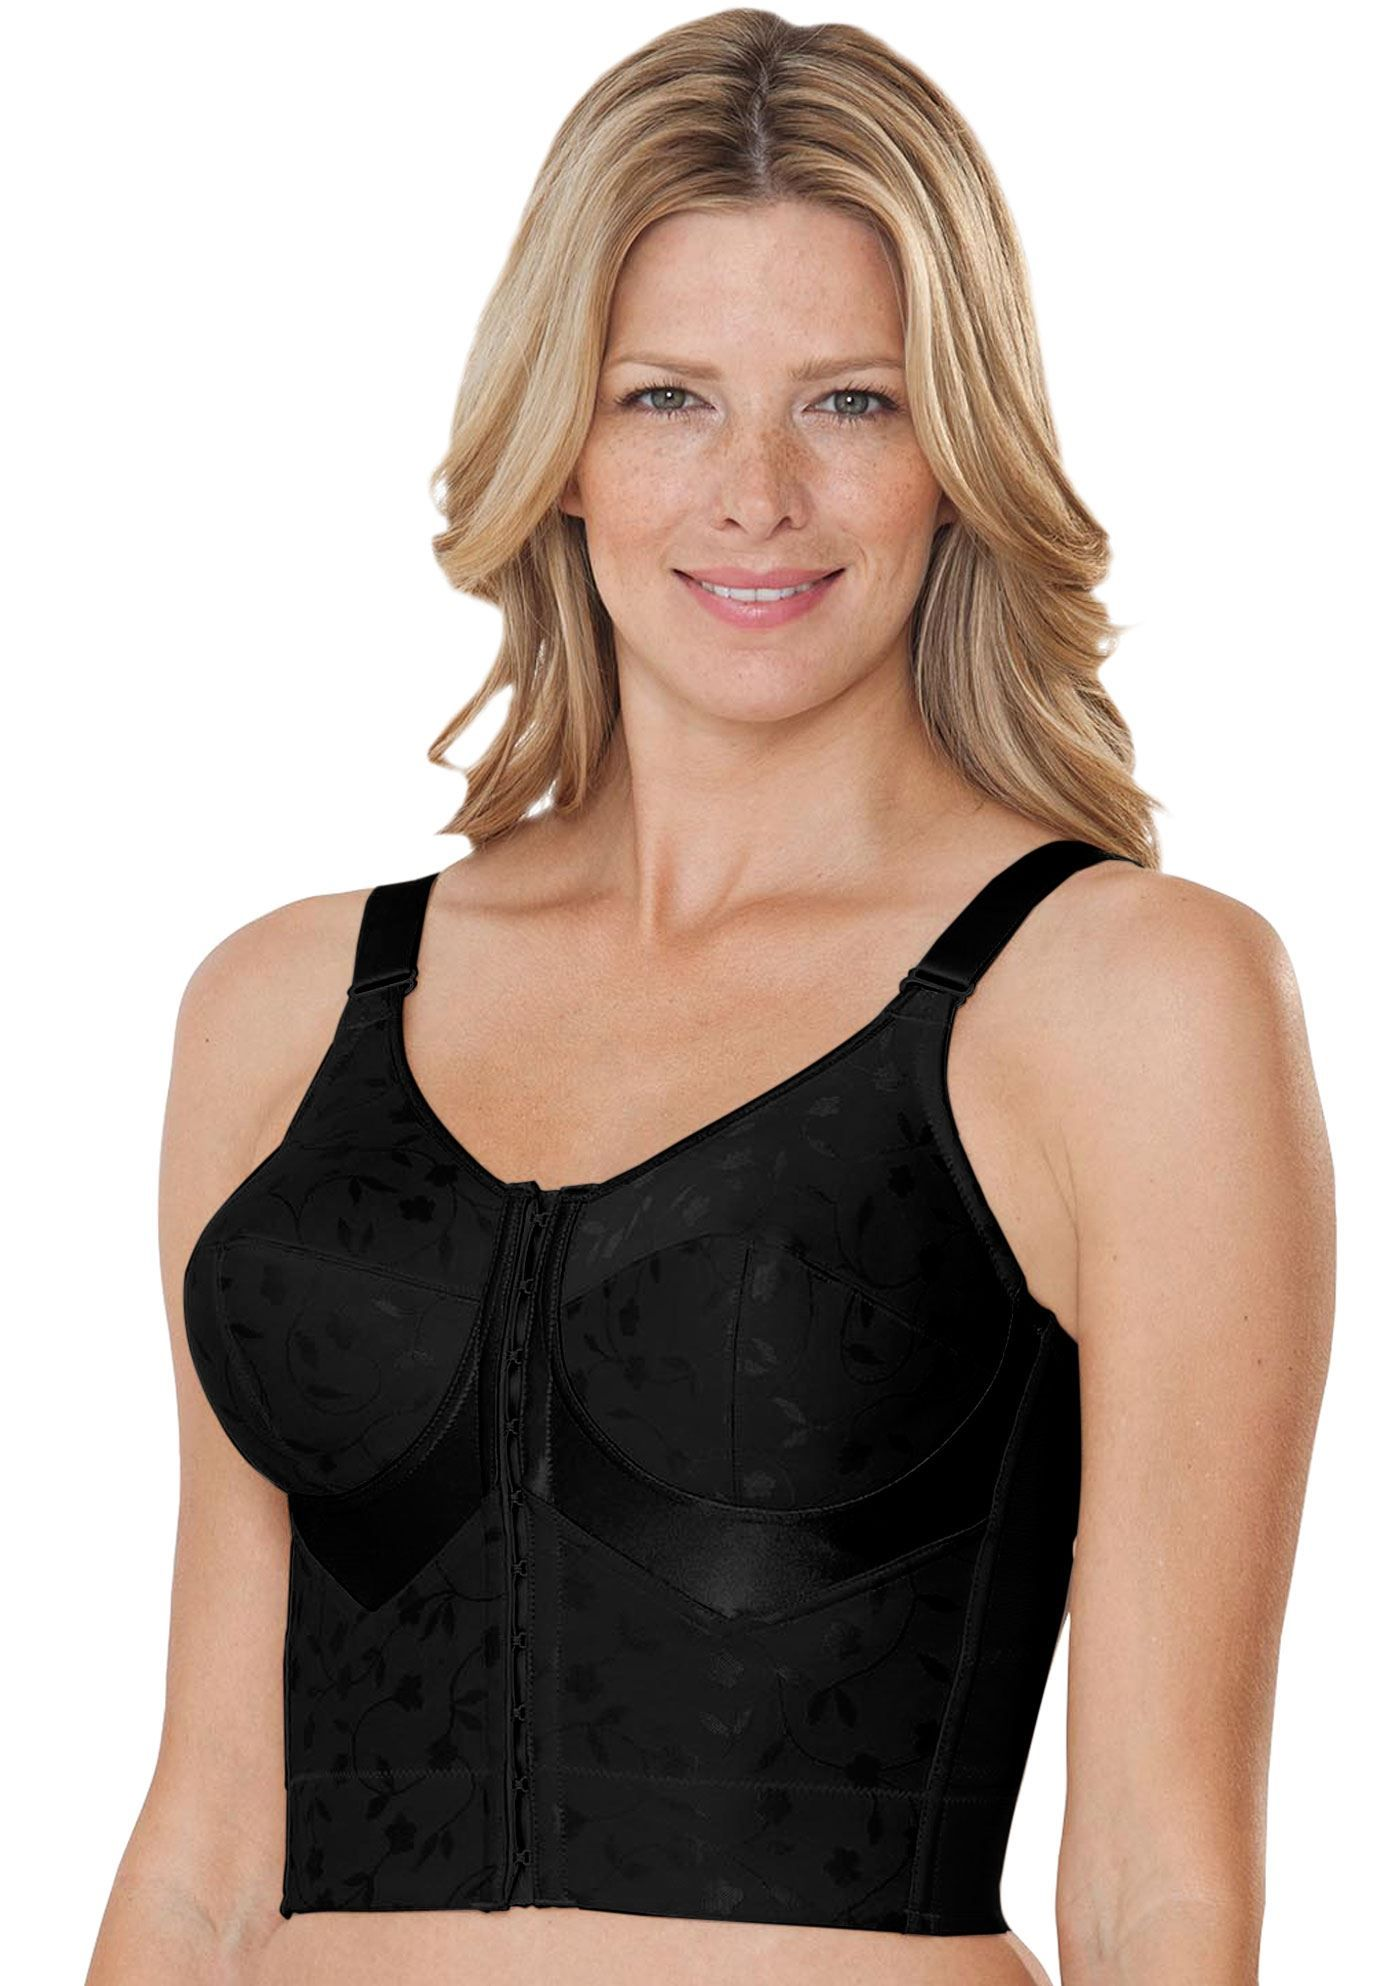 Easy Enhancer Longline Posture Bra by Comfort Choice